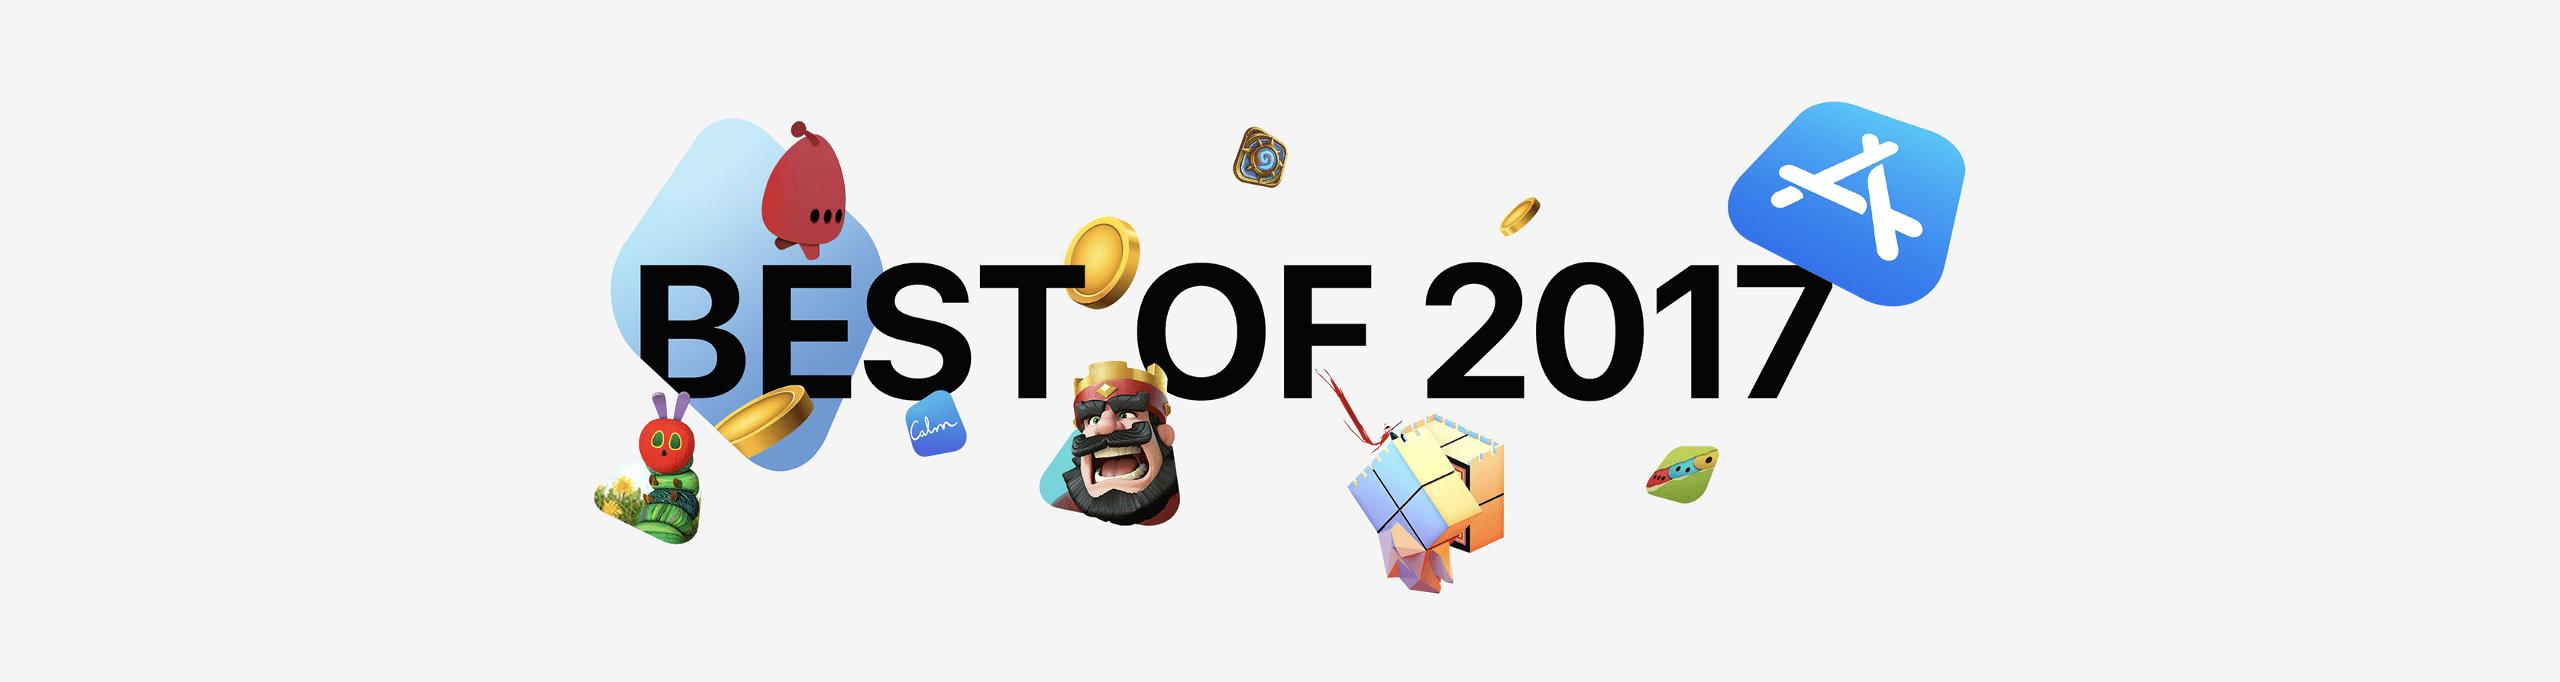 Vampr in Apple Best of 2017